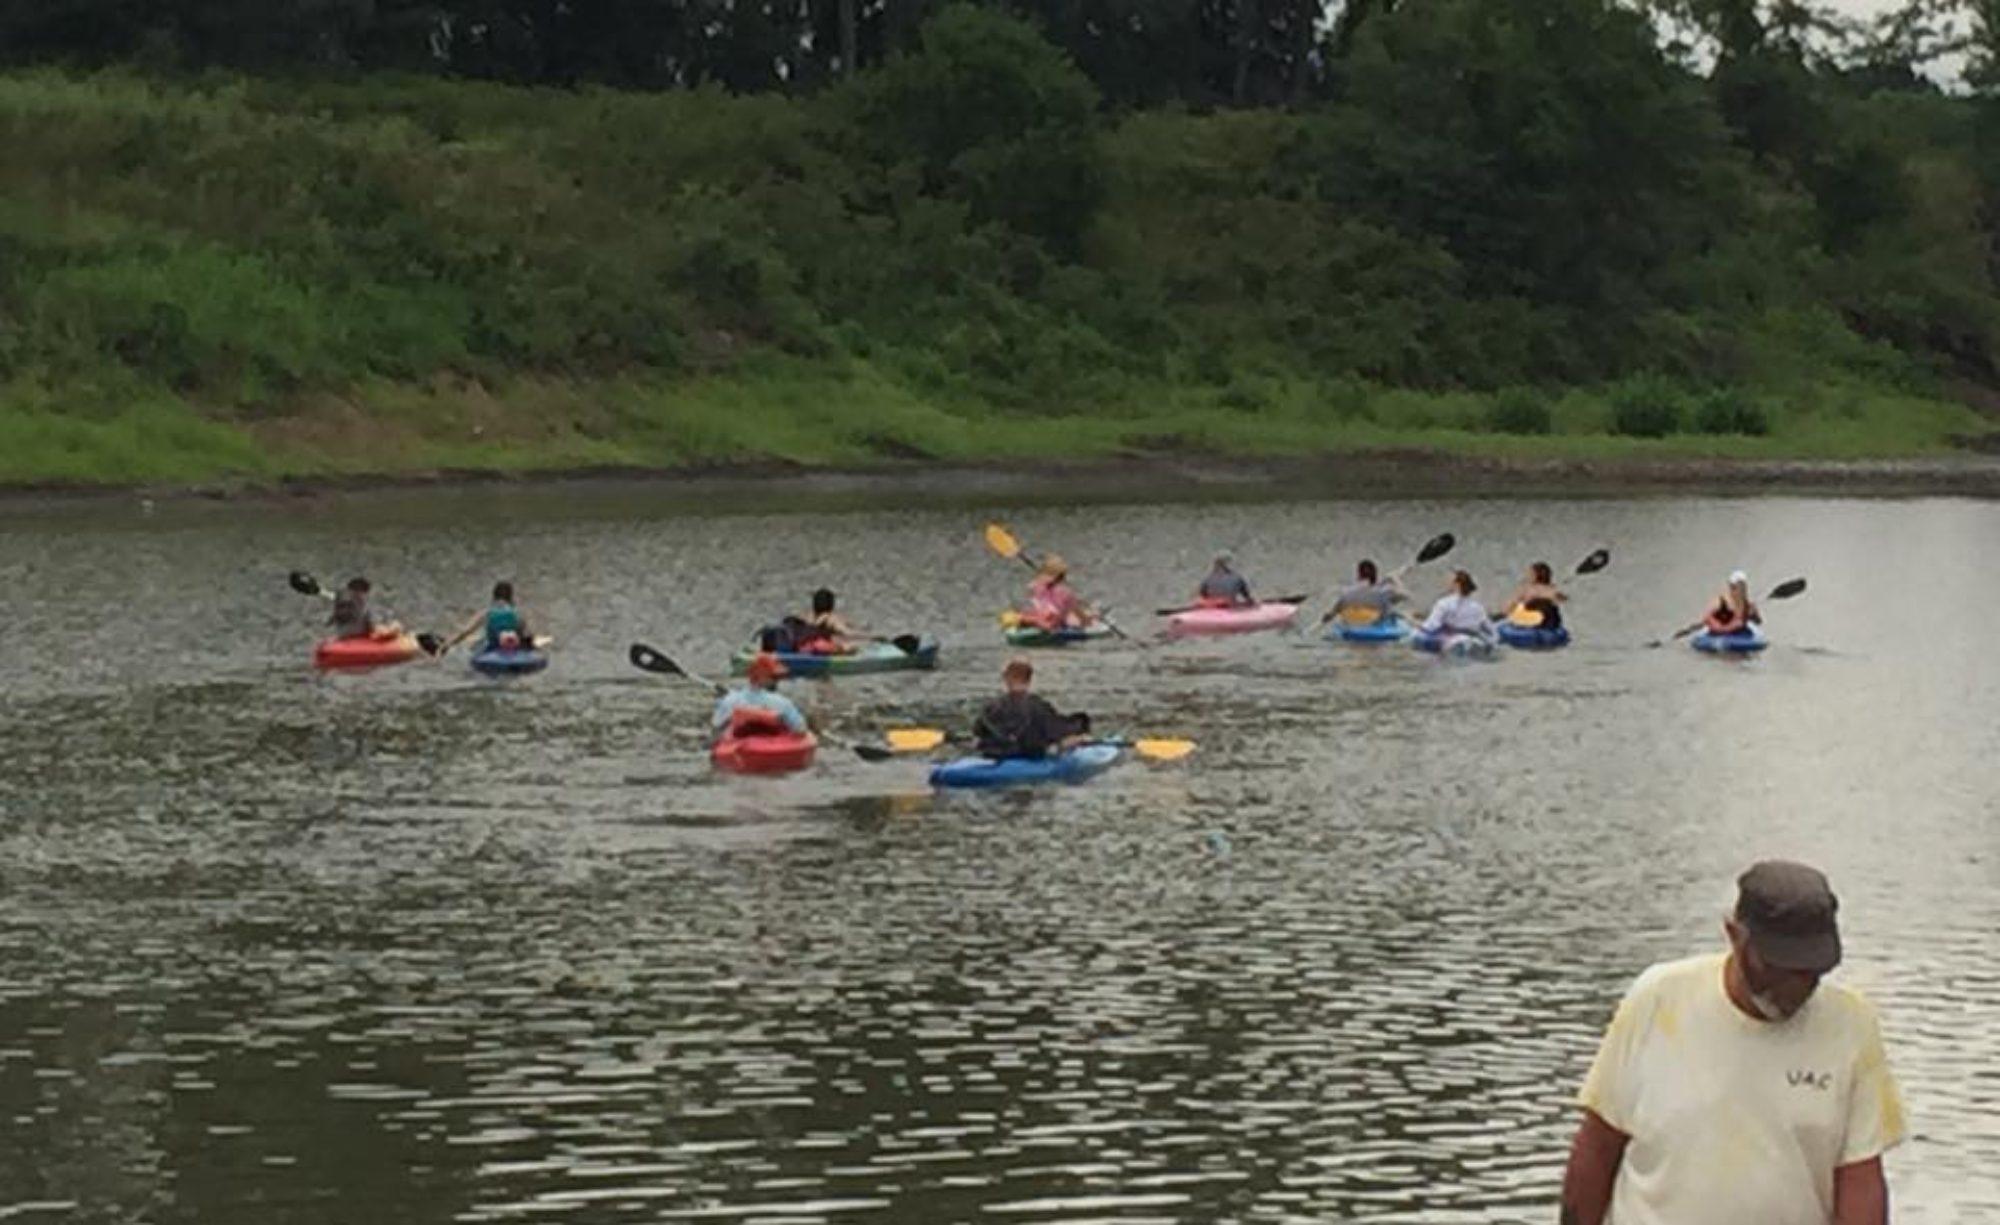 Up A Creek Canoe and Kayak Rental